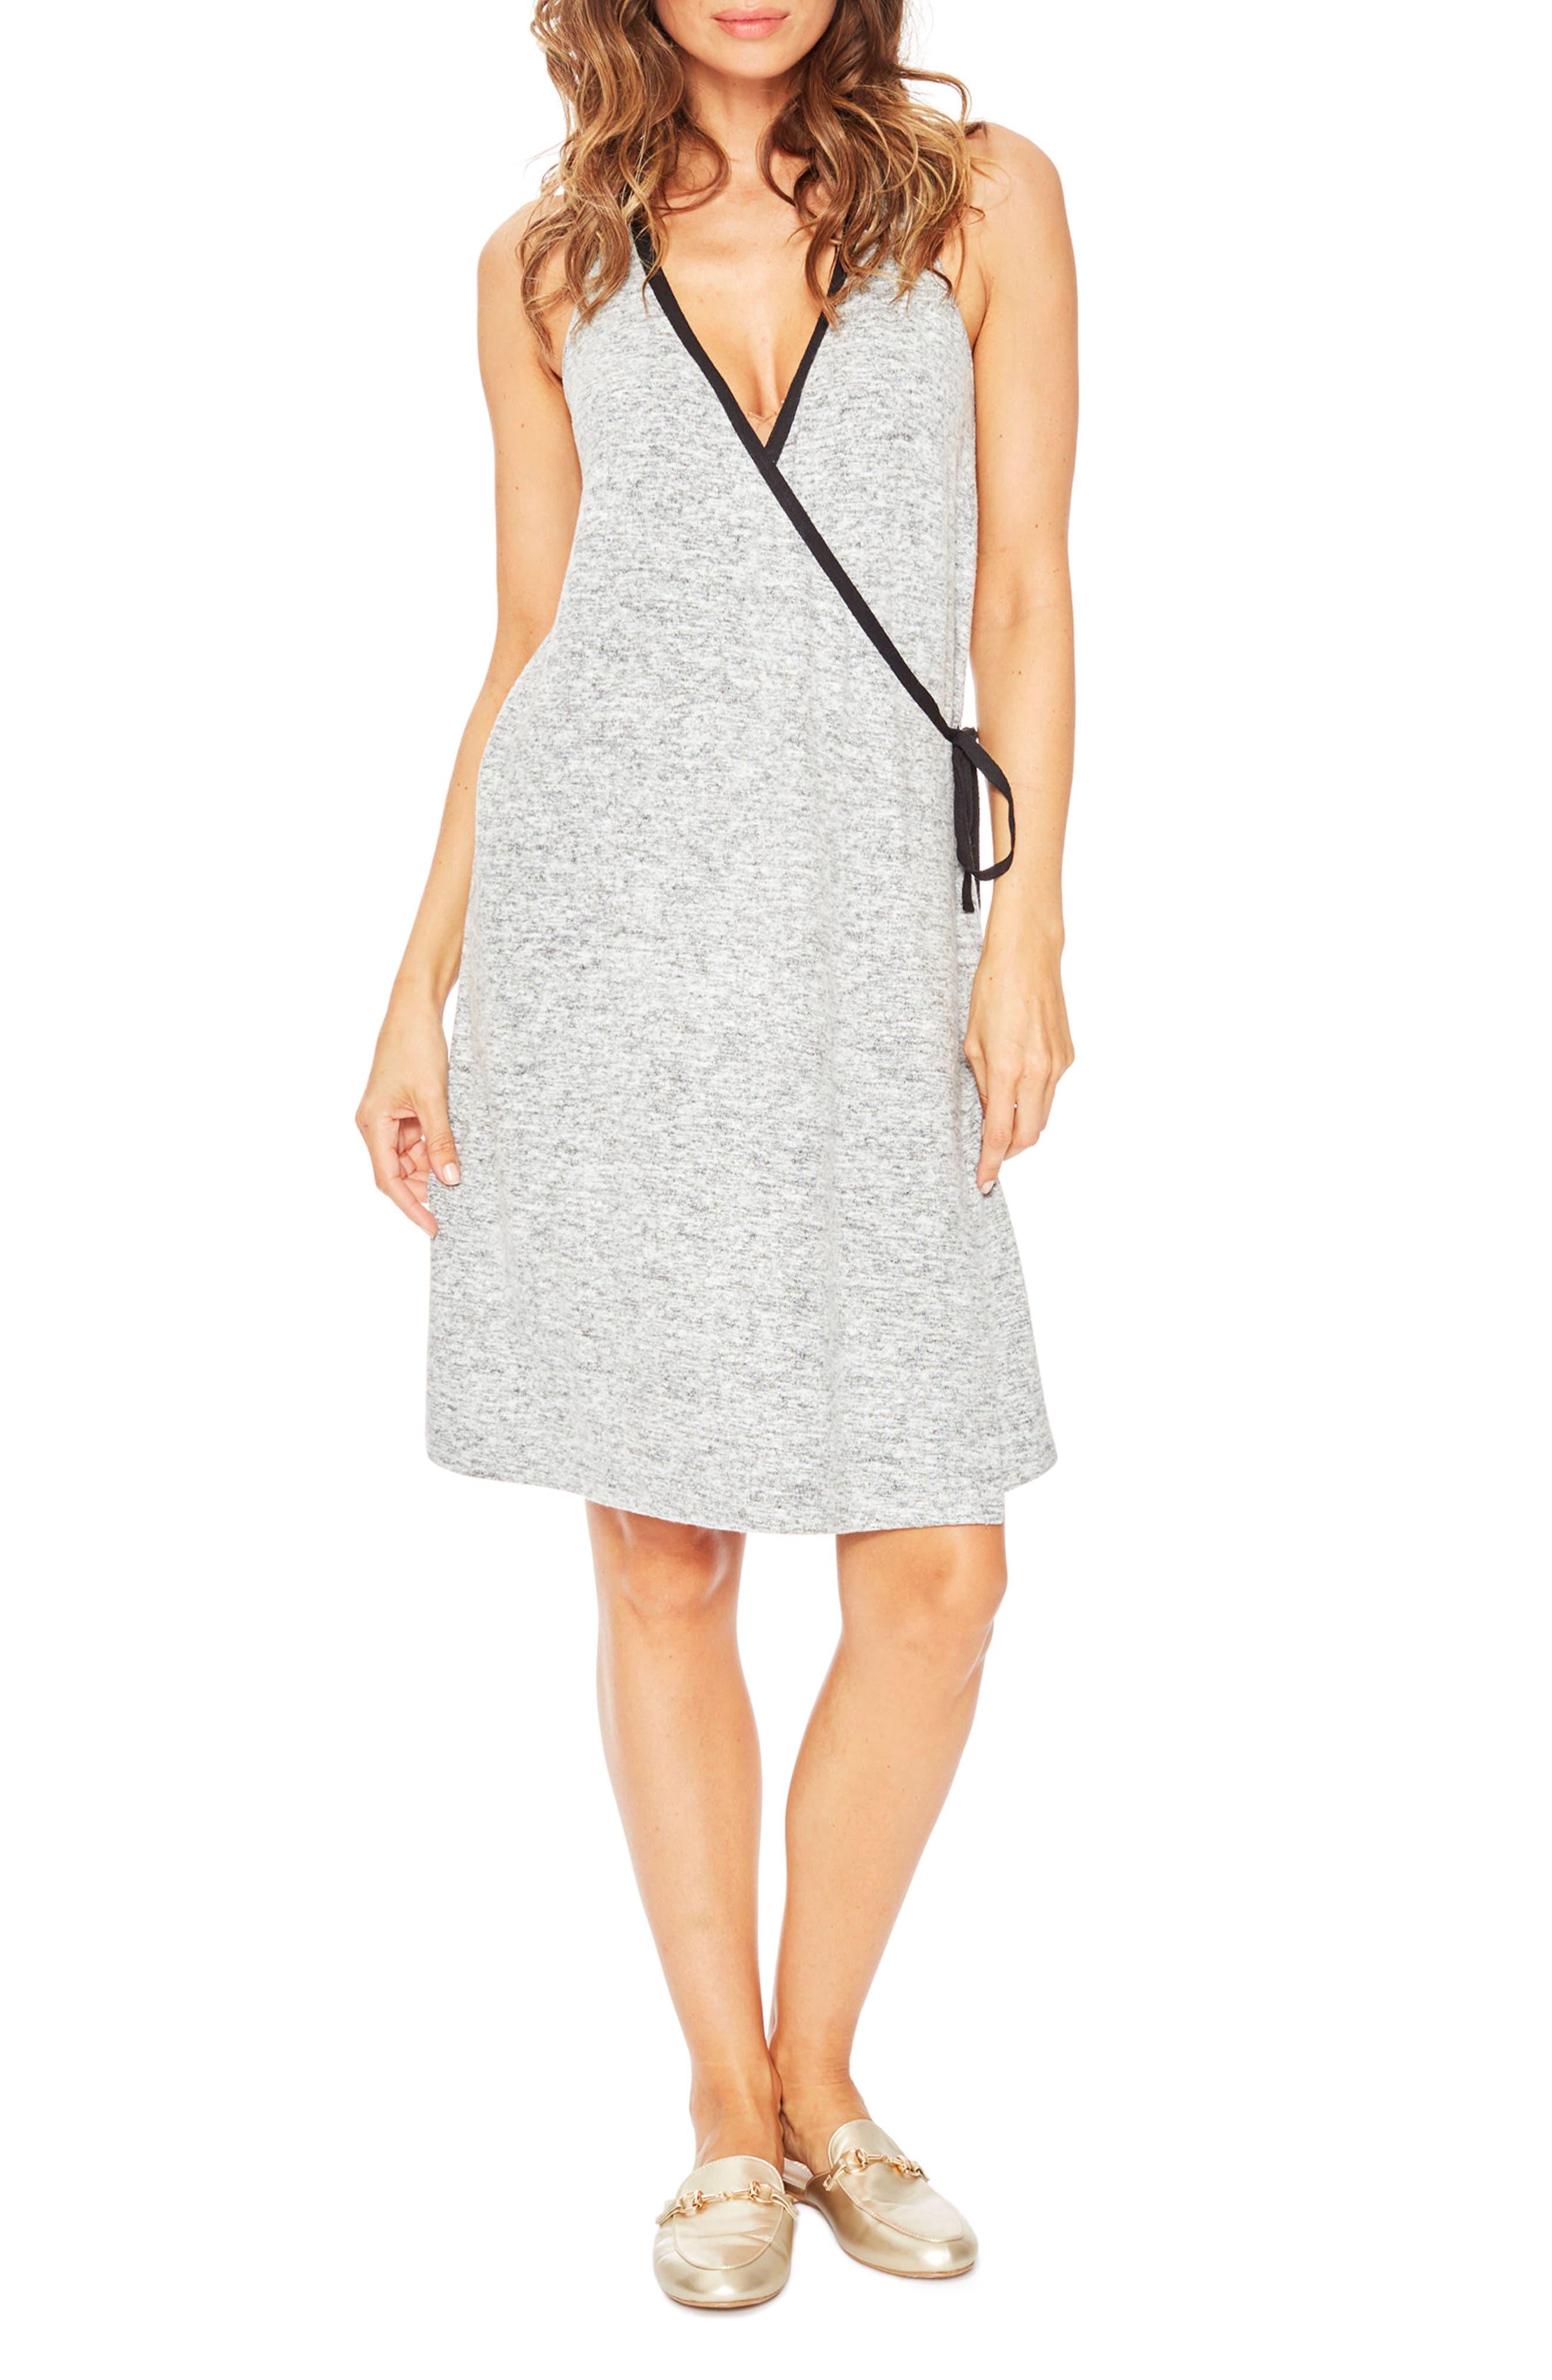 Rosie Pope Kelsey Maternity Nightgown, Grey